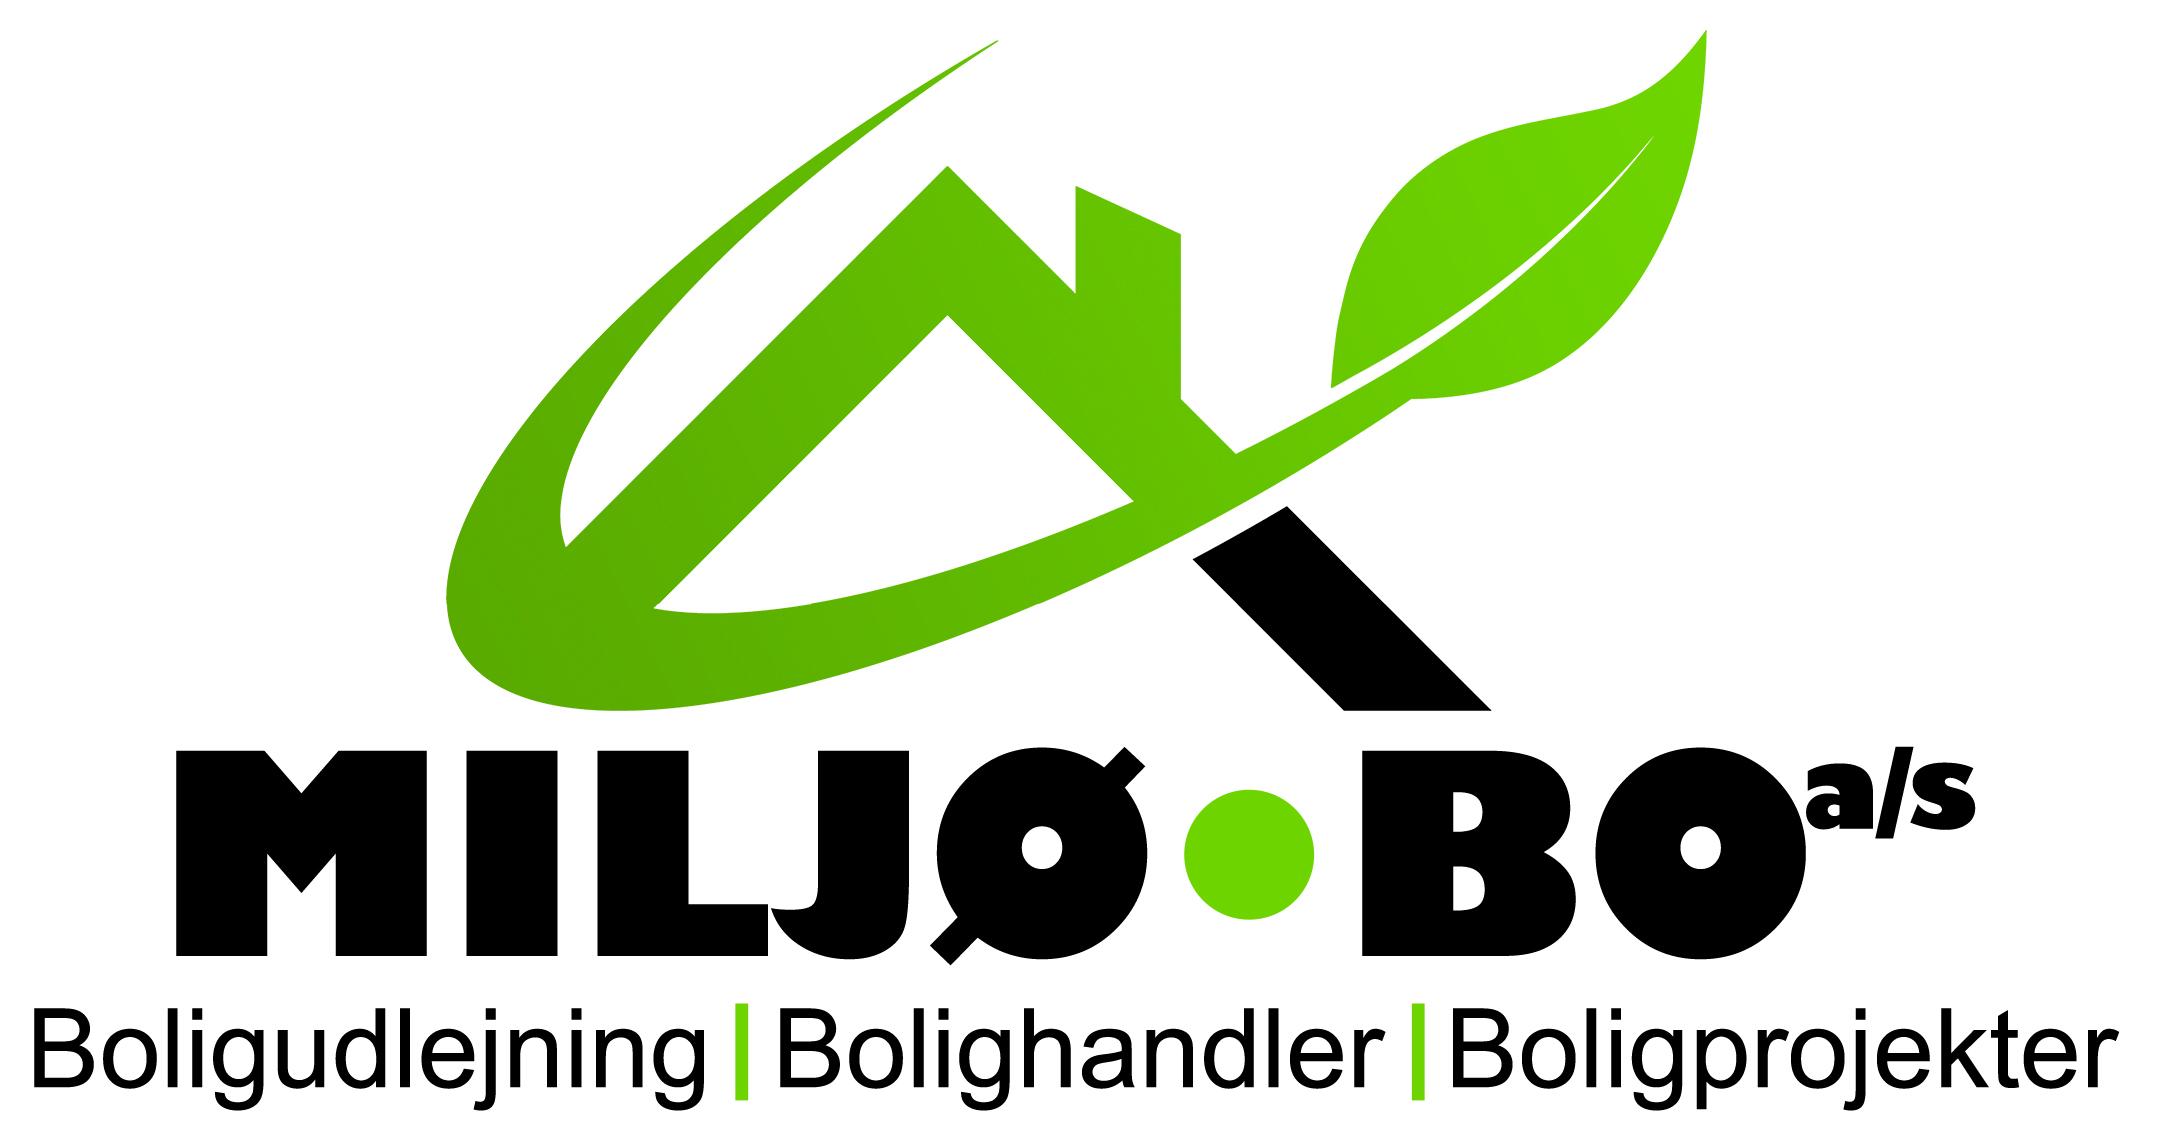 Logo Miljoe-bo.jpg